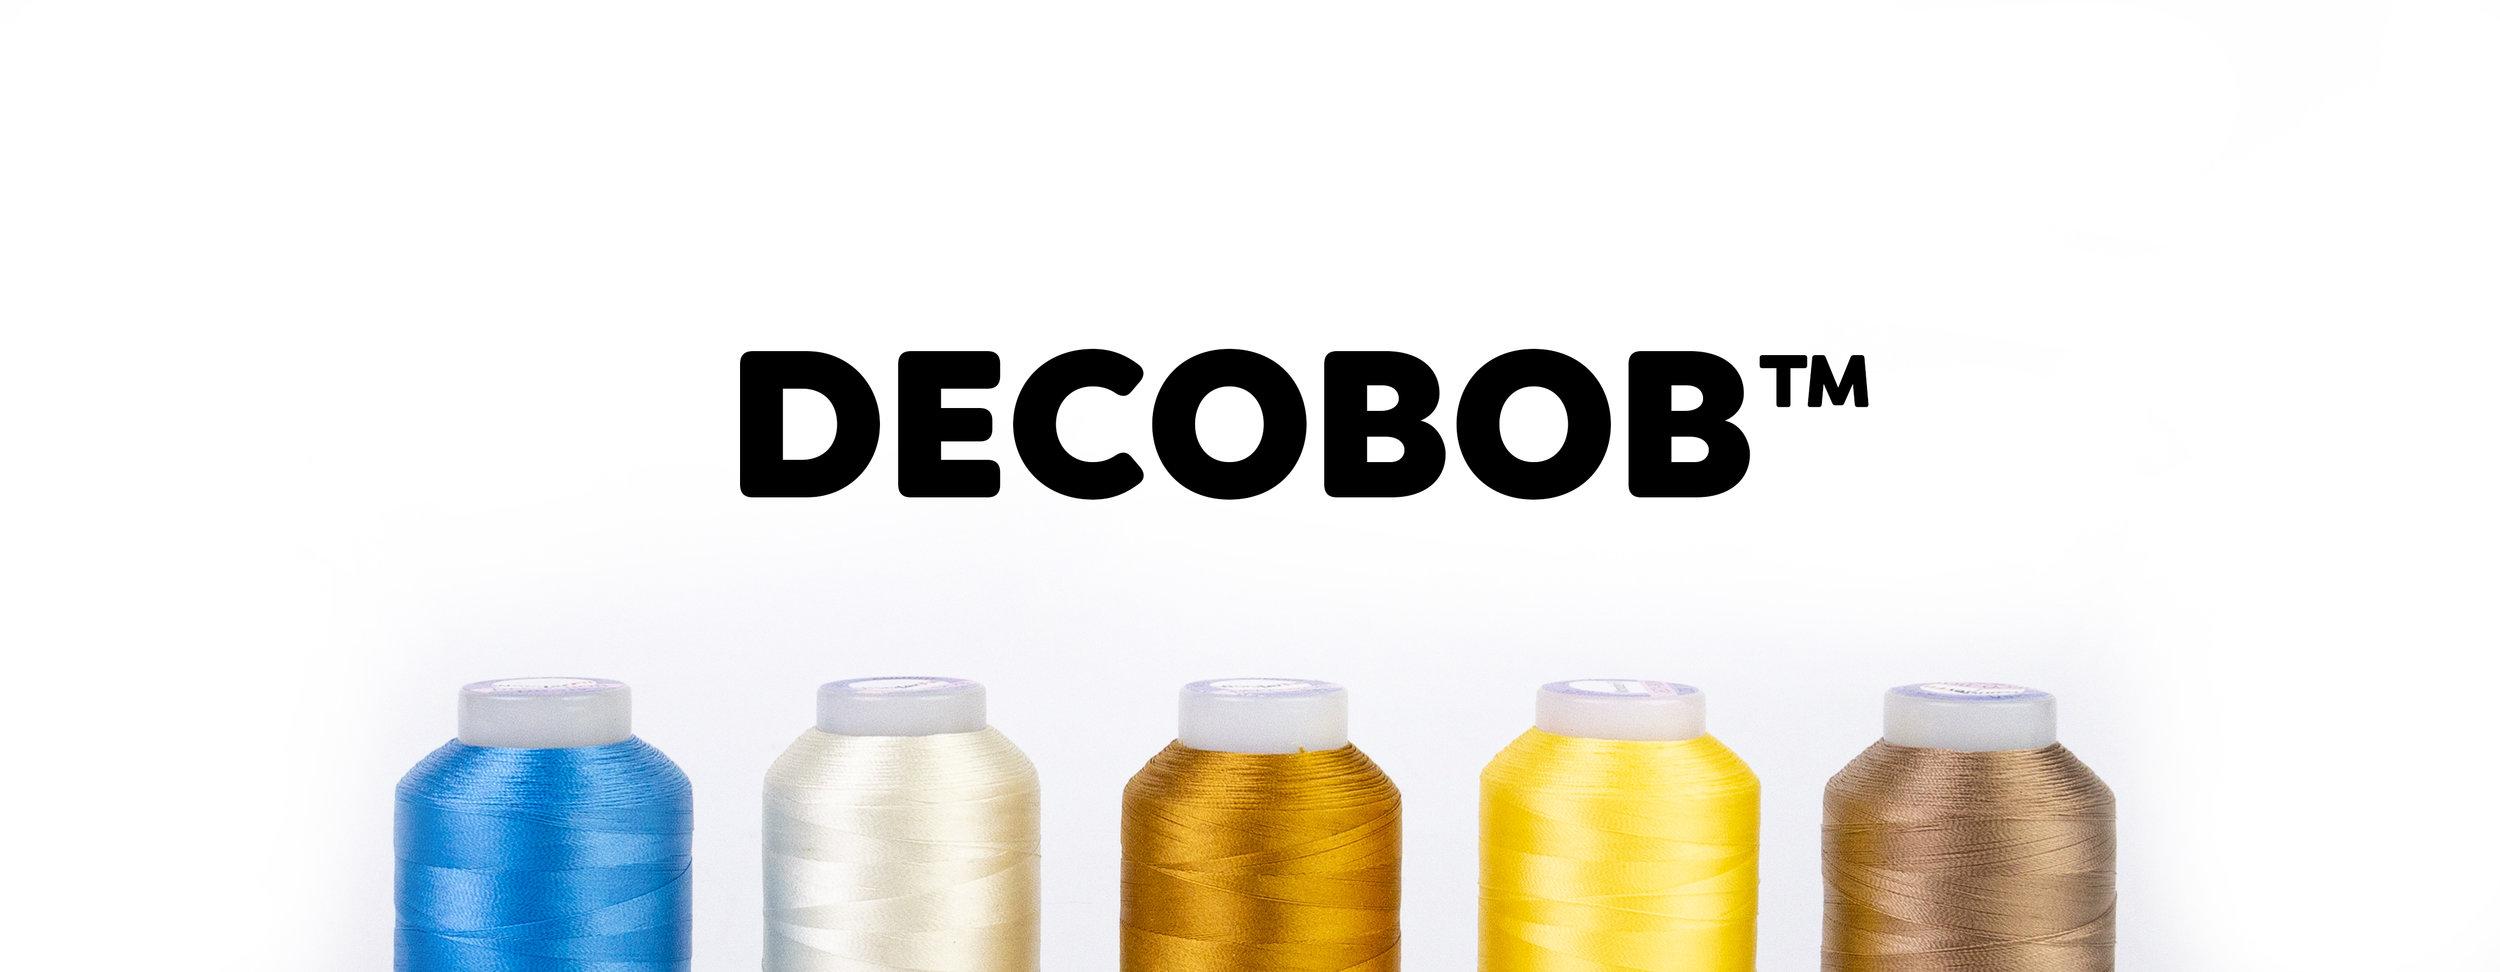 DecoBob-banner.jpg